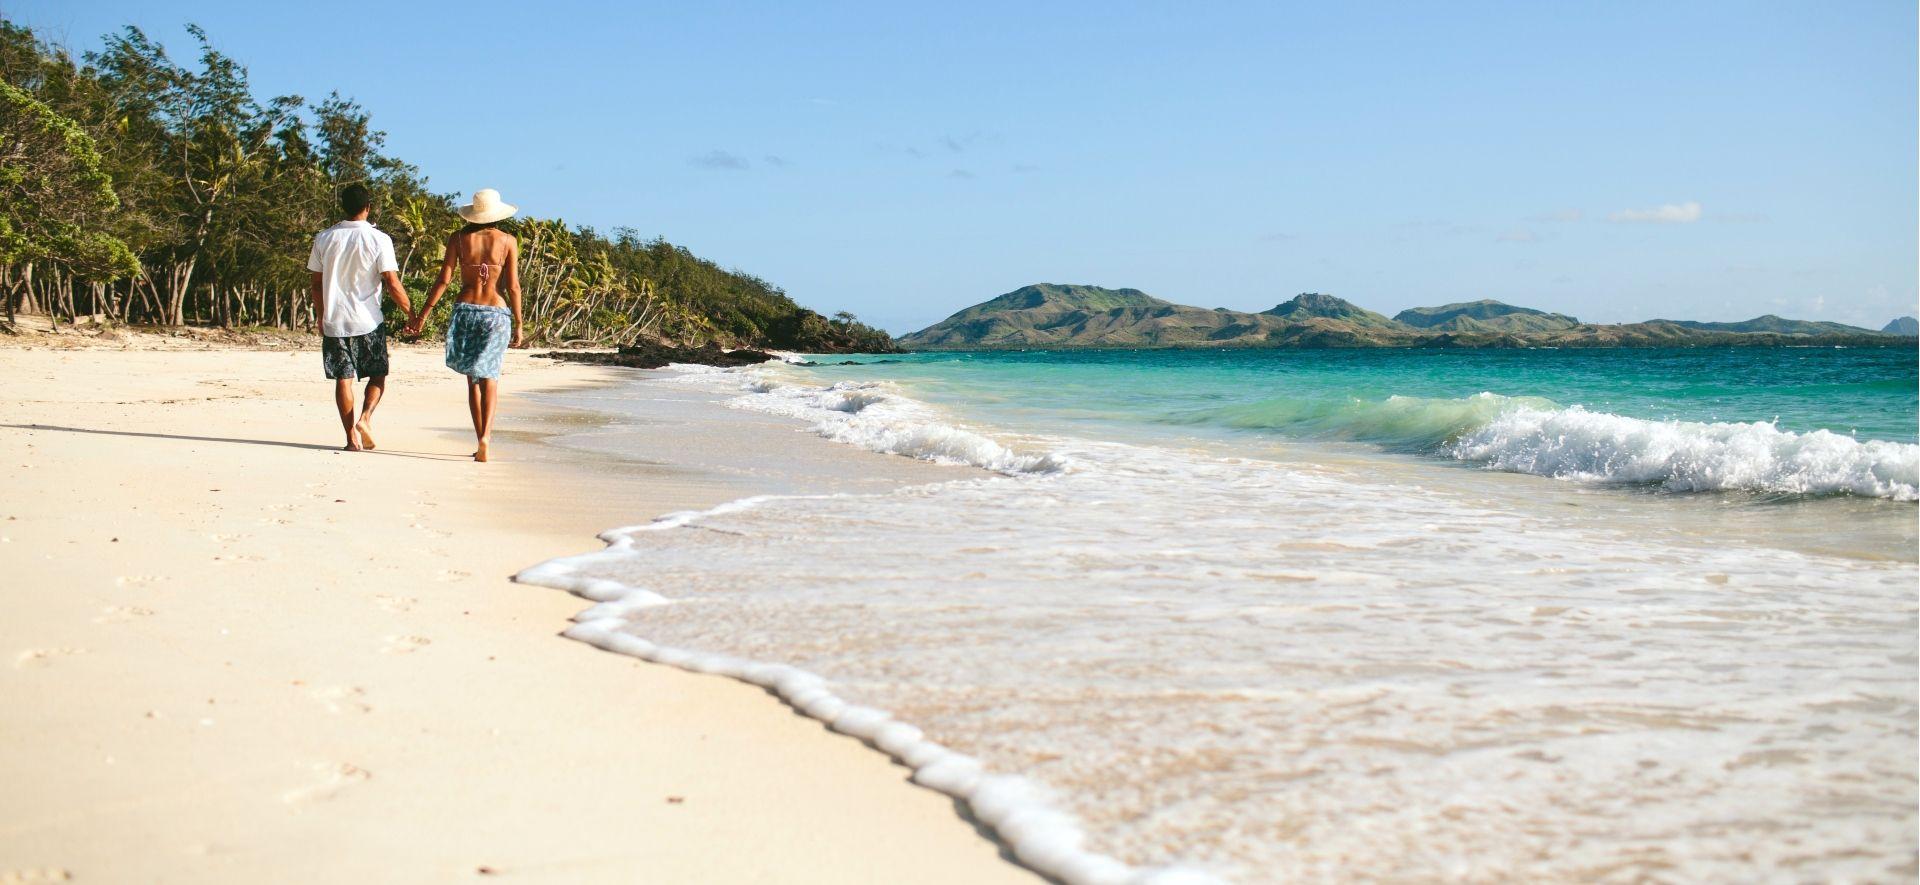 Turtle Island paradise